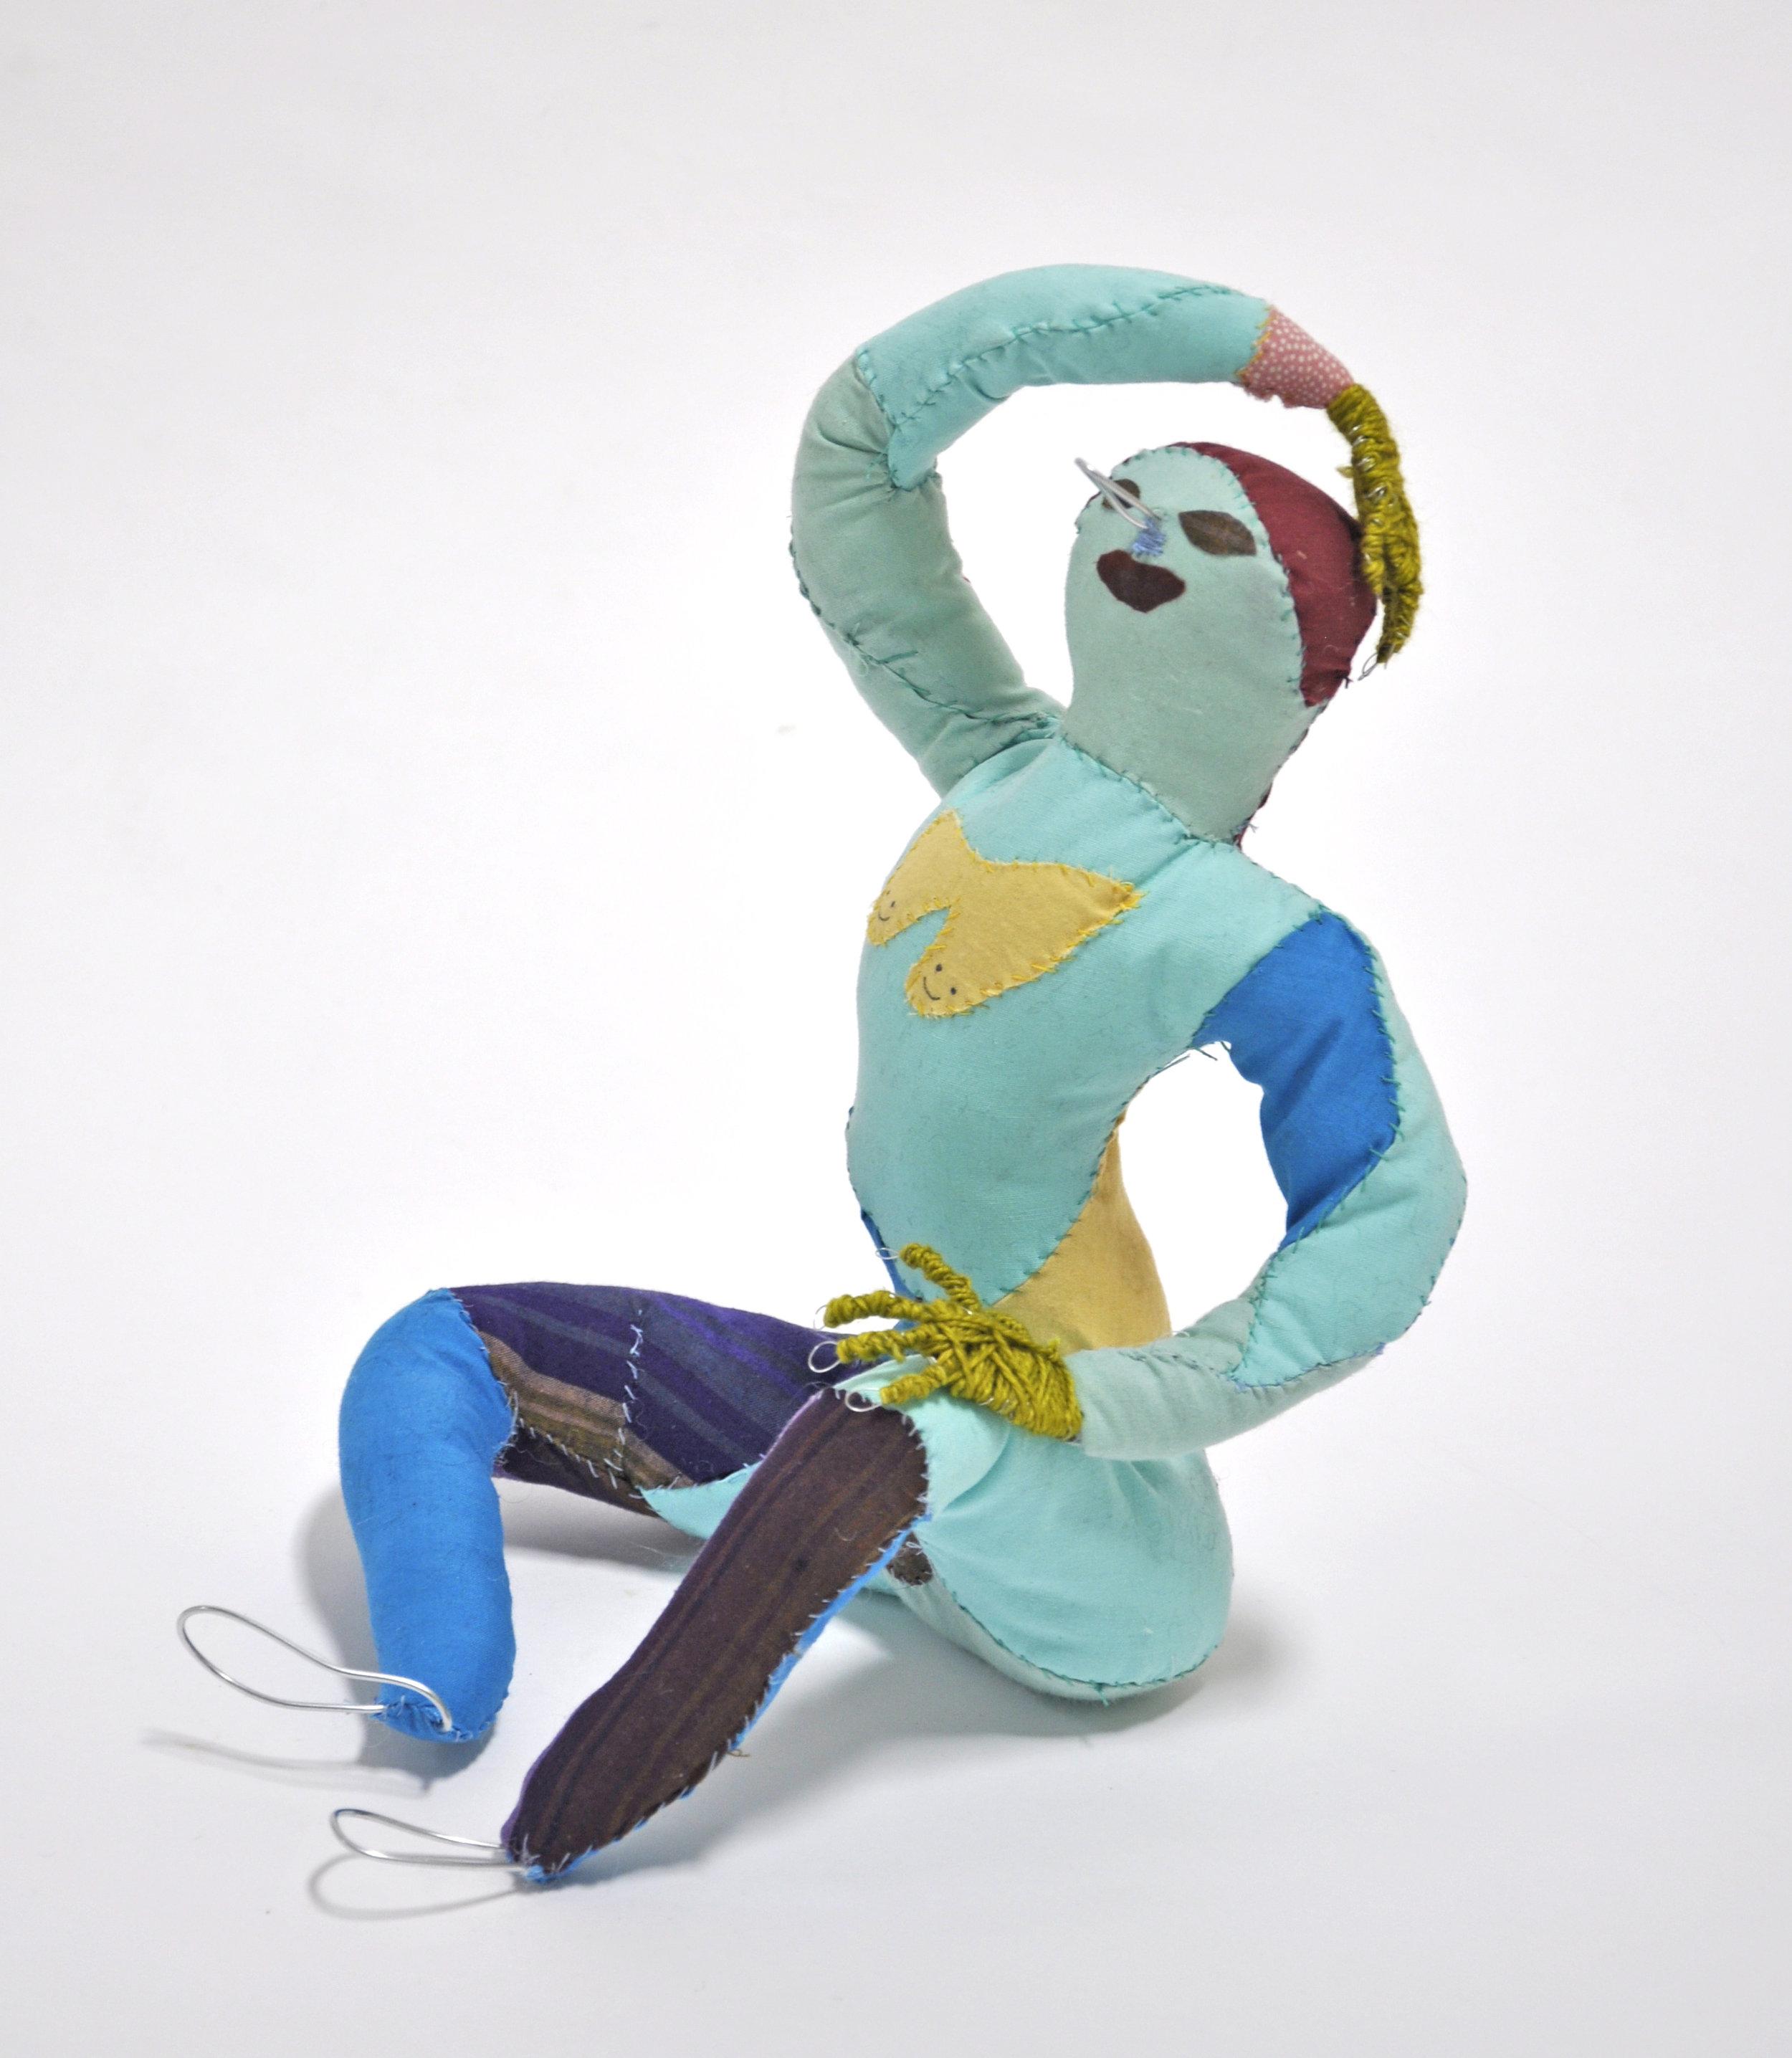 "Maria Guzmán Capron, ""Burbuja"", 2018, Wire, Batting, Fabric, Thread, Yarn, 11 x 9 x 8in"